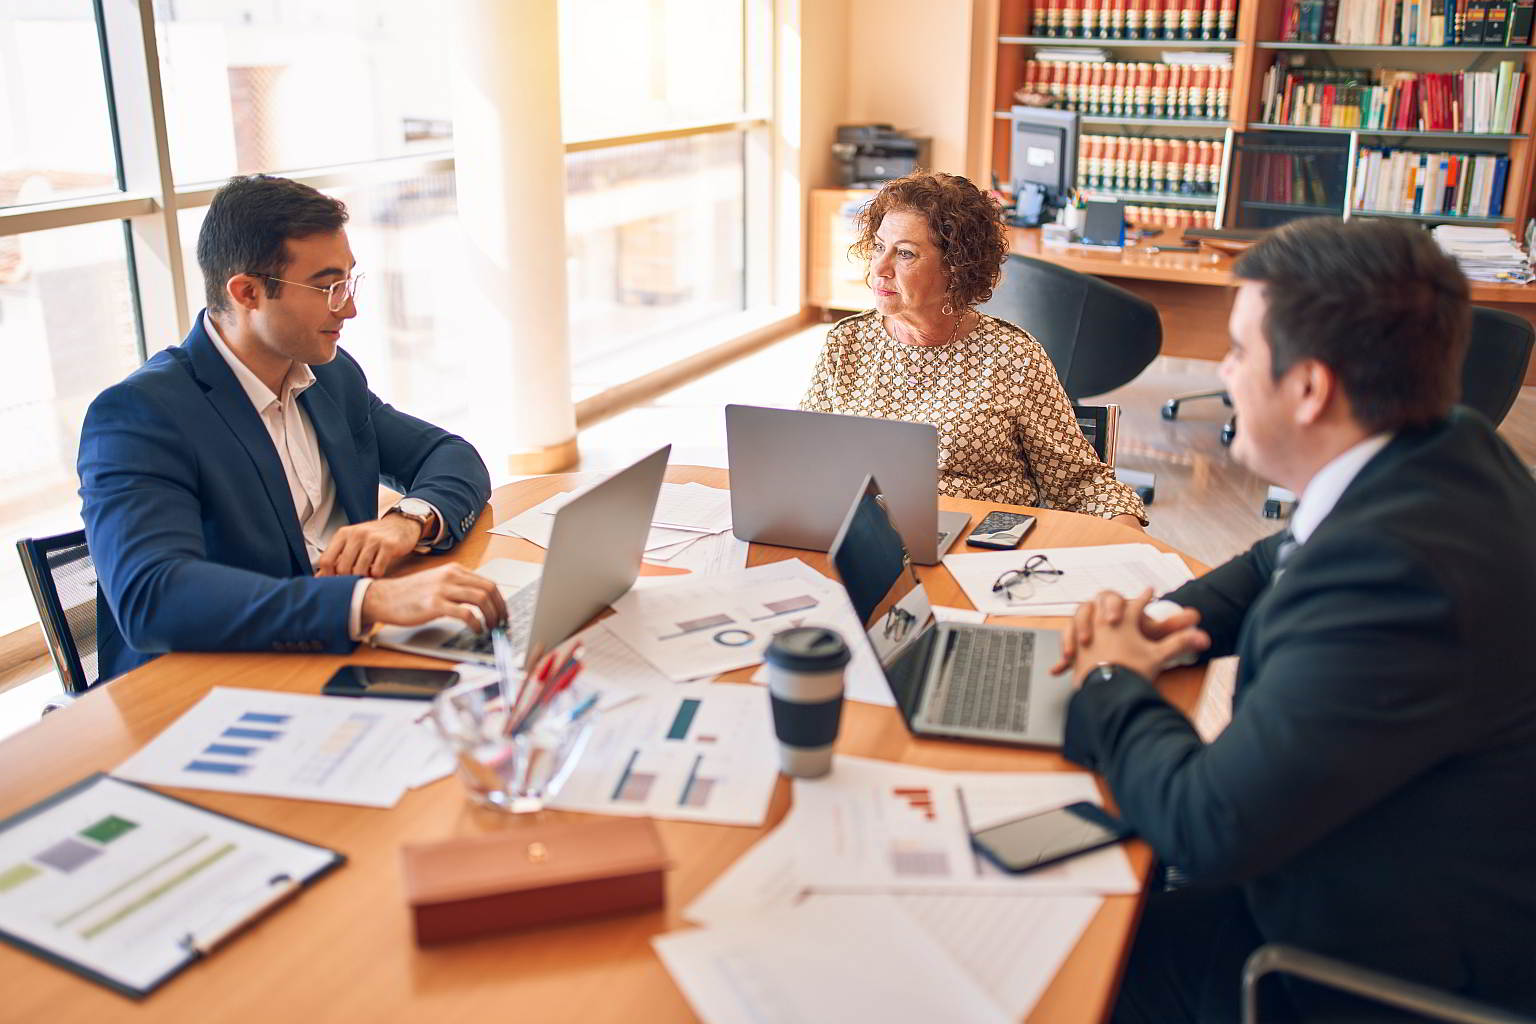 Law firm modernization options